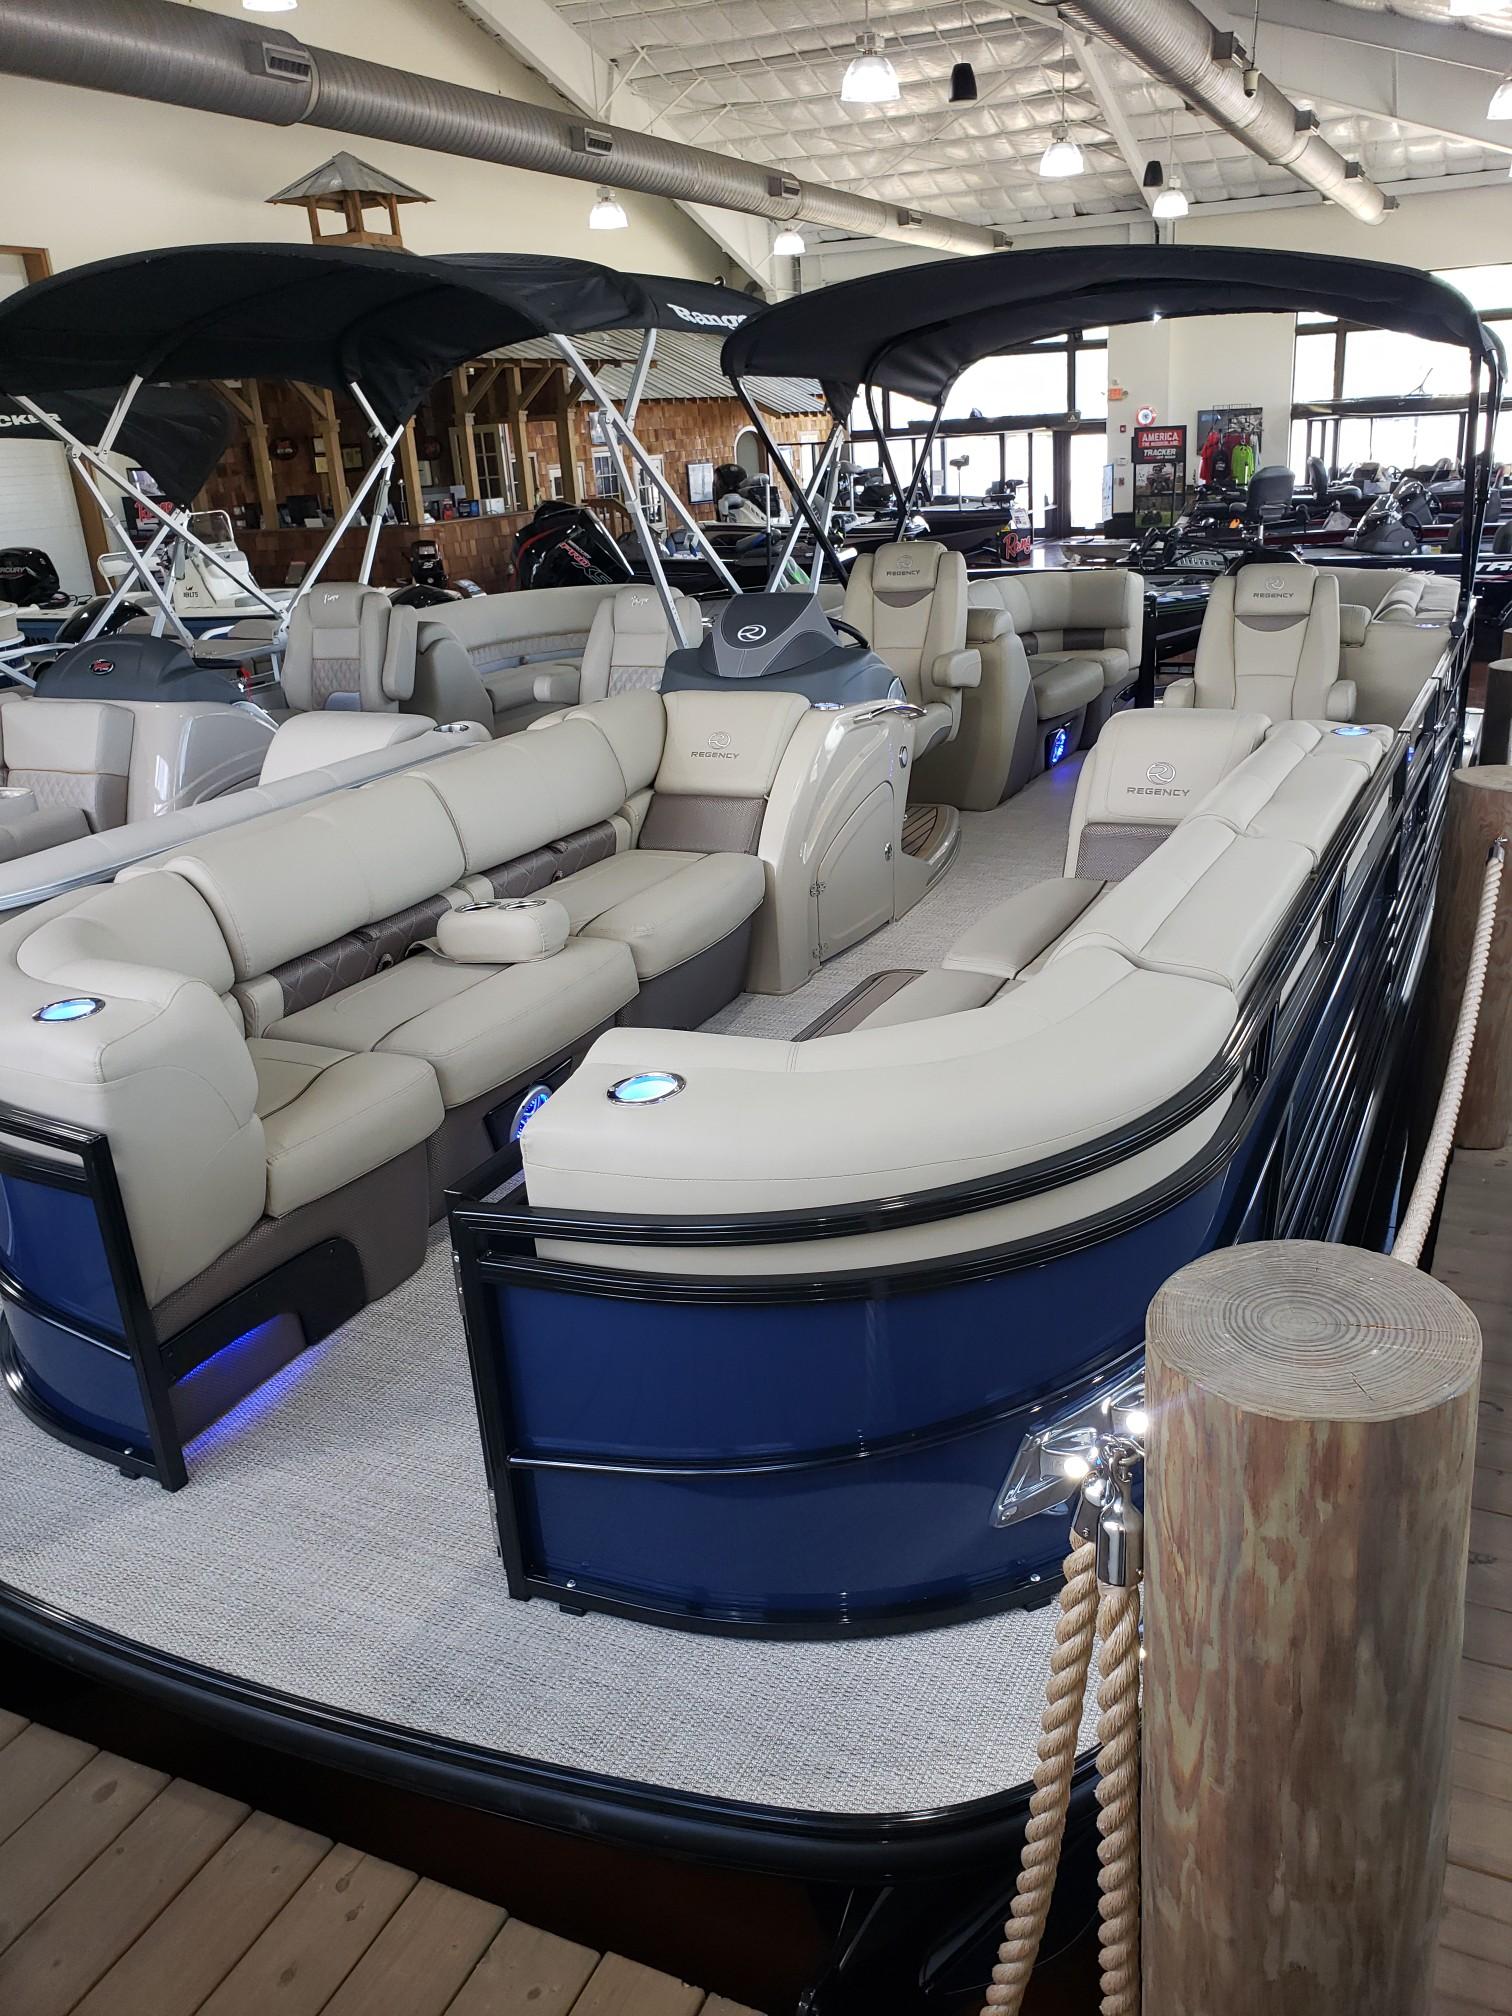 2020 Regency boat for sale, model of the boat is 250 LE3 w/300L Verado & Image # 10 of 27